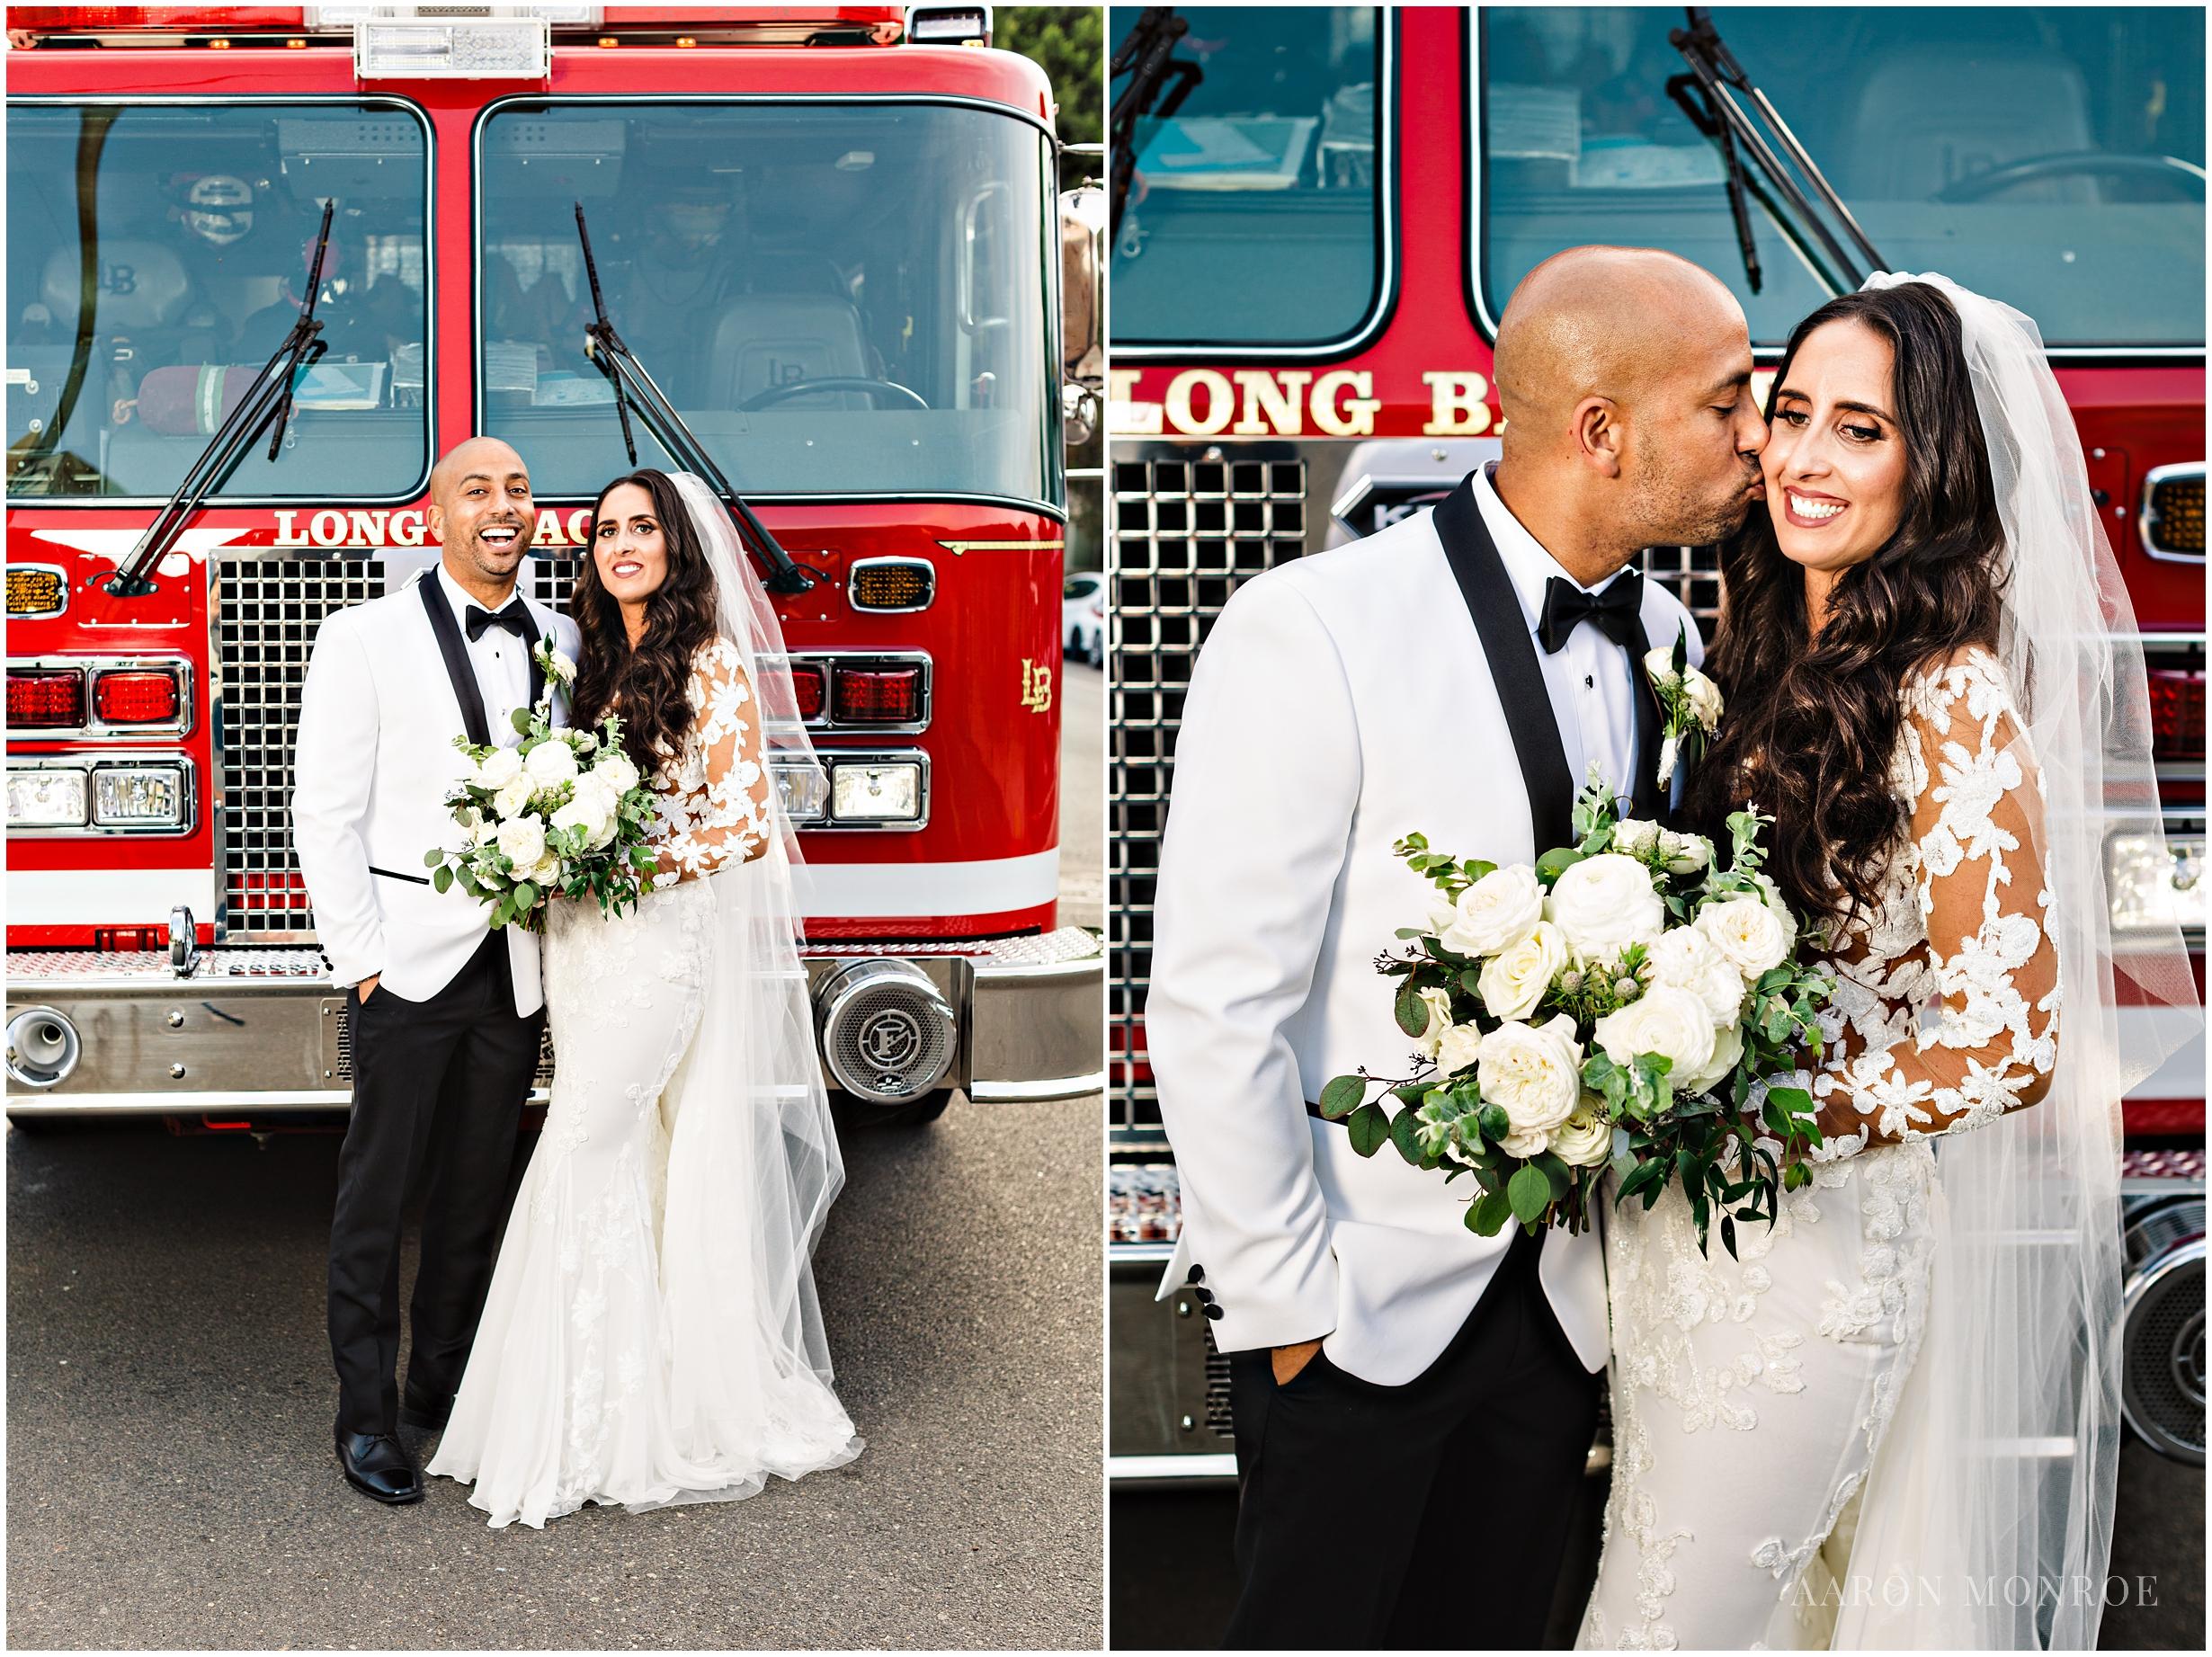 Ebell_Long_Beach_Wedding_Photography_0855.jpg